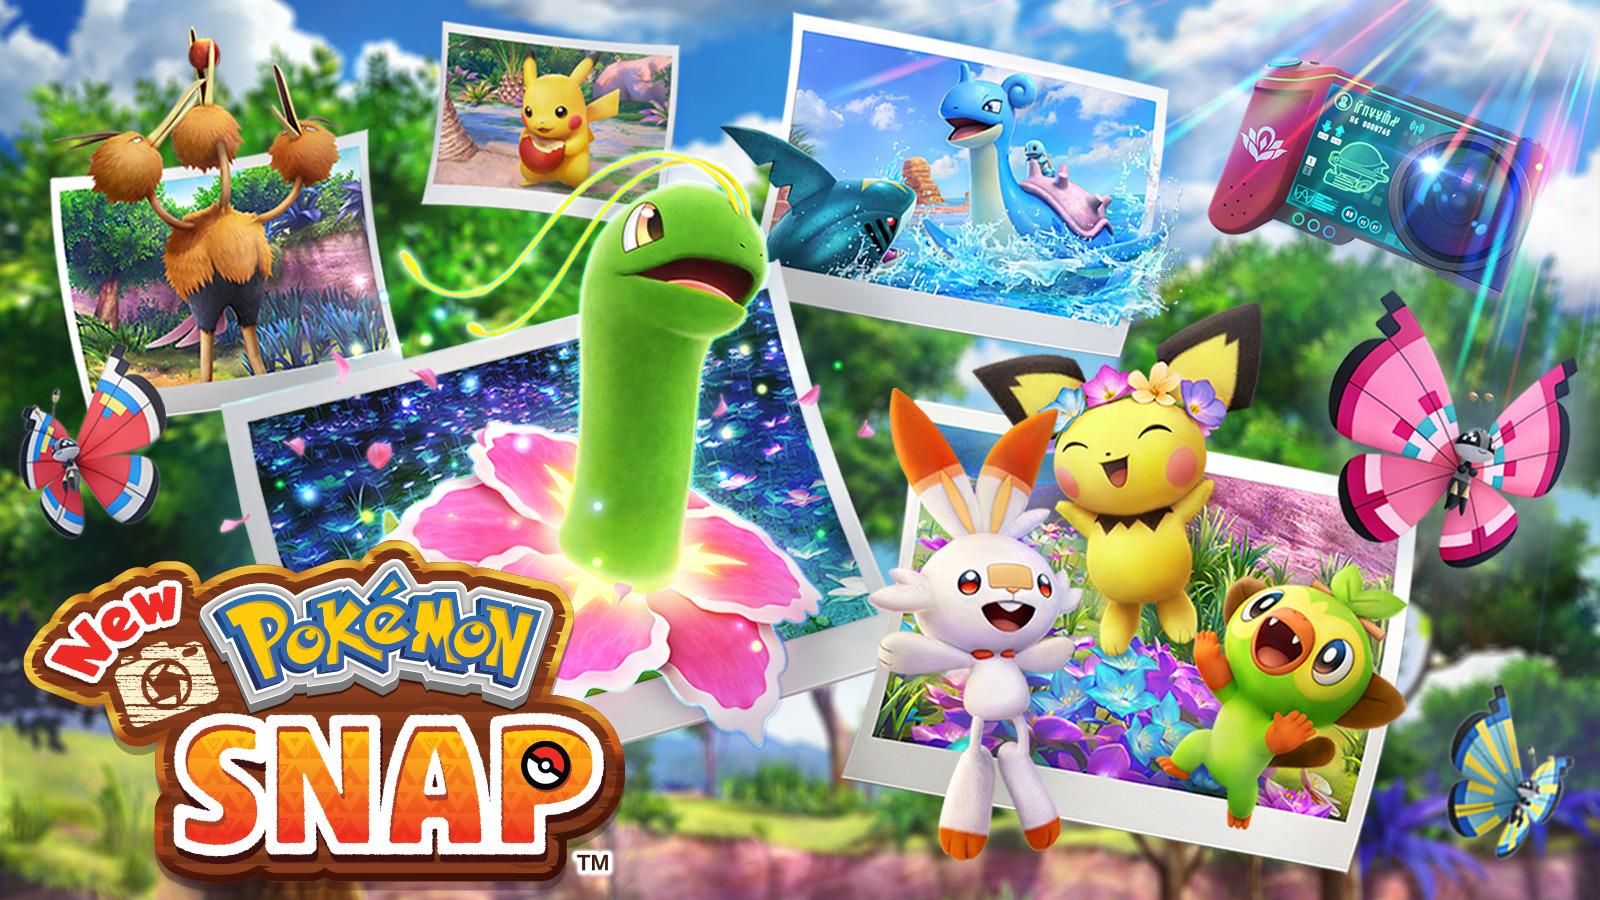 New Pokemon Snap arrives April 30, 2021